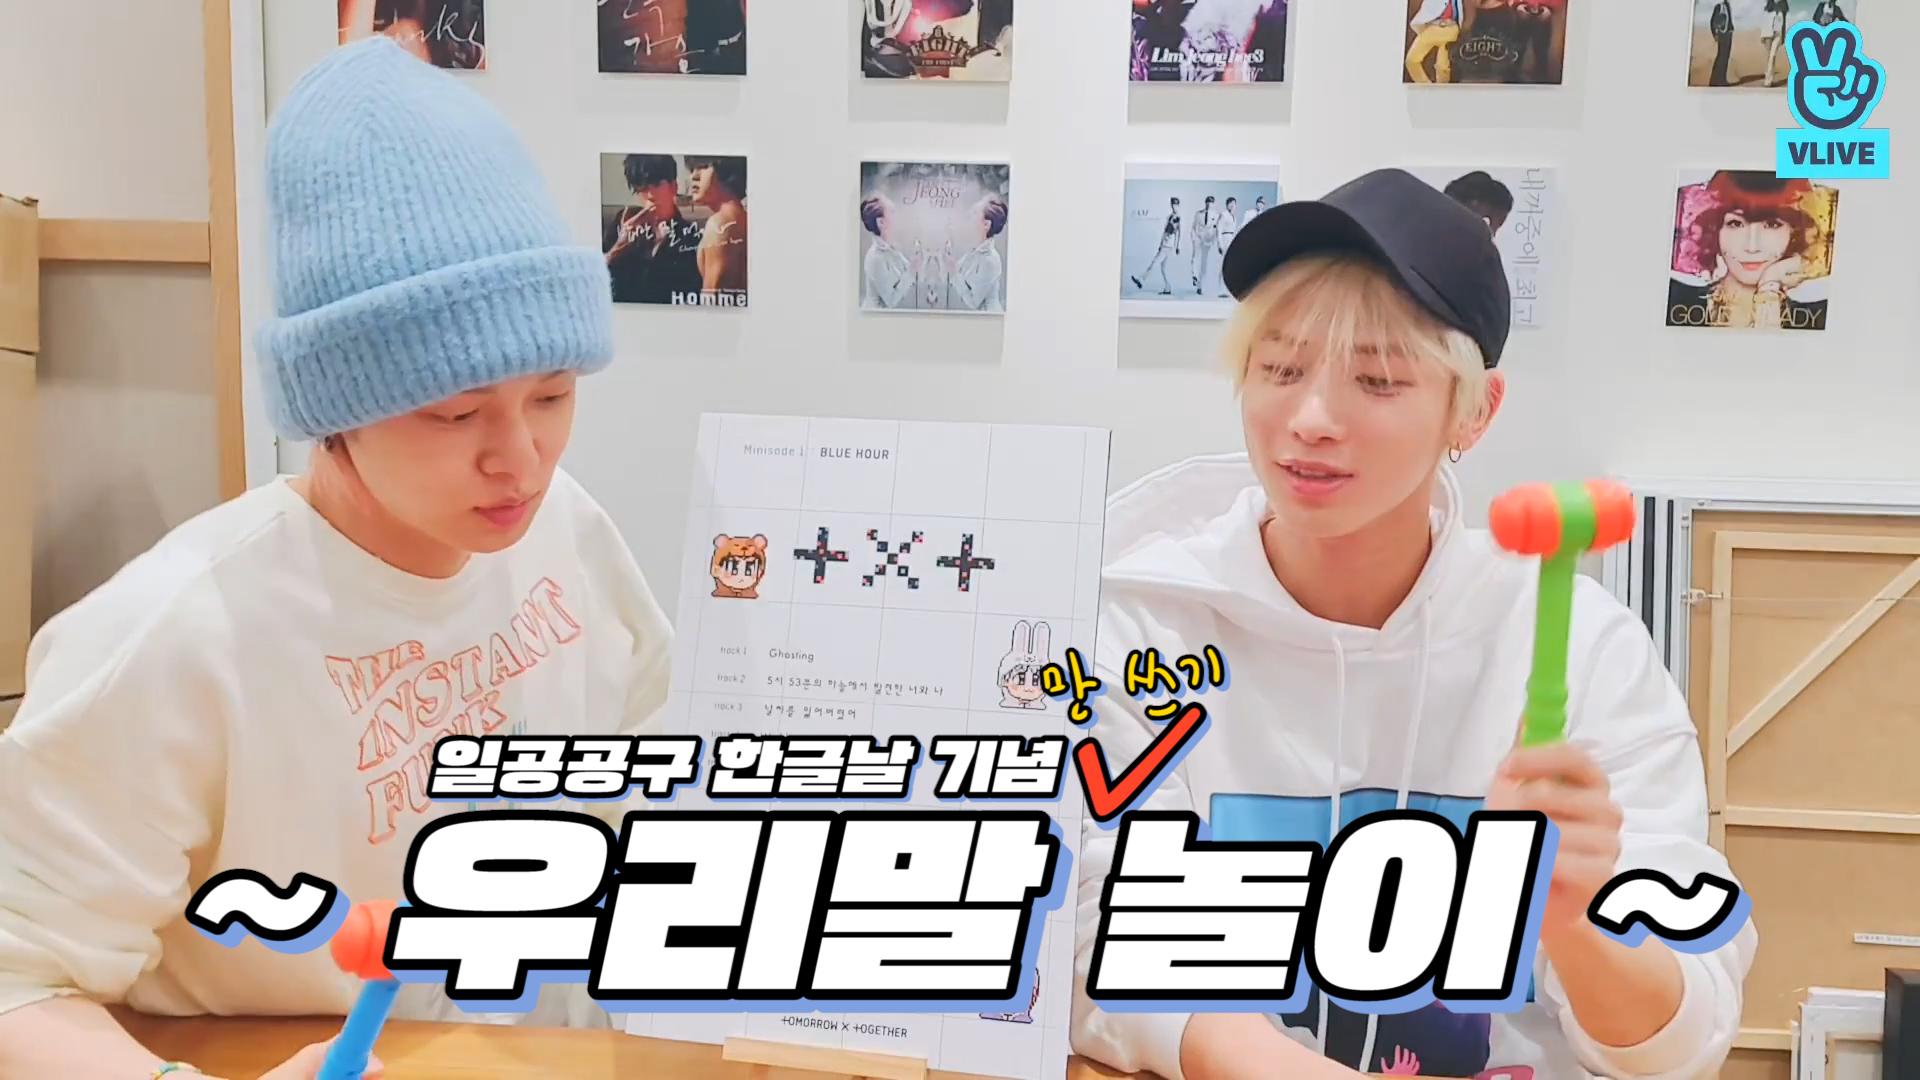 [TXT] ‼️방심금물‼️ 냥냥즈의 우리말만 쓰기 놀이🥊 (Yeonjun&Taehyun speaking only in Korean)